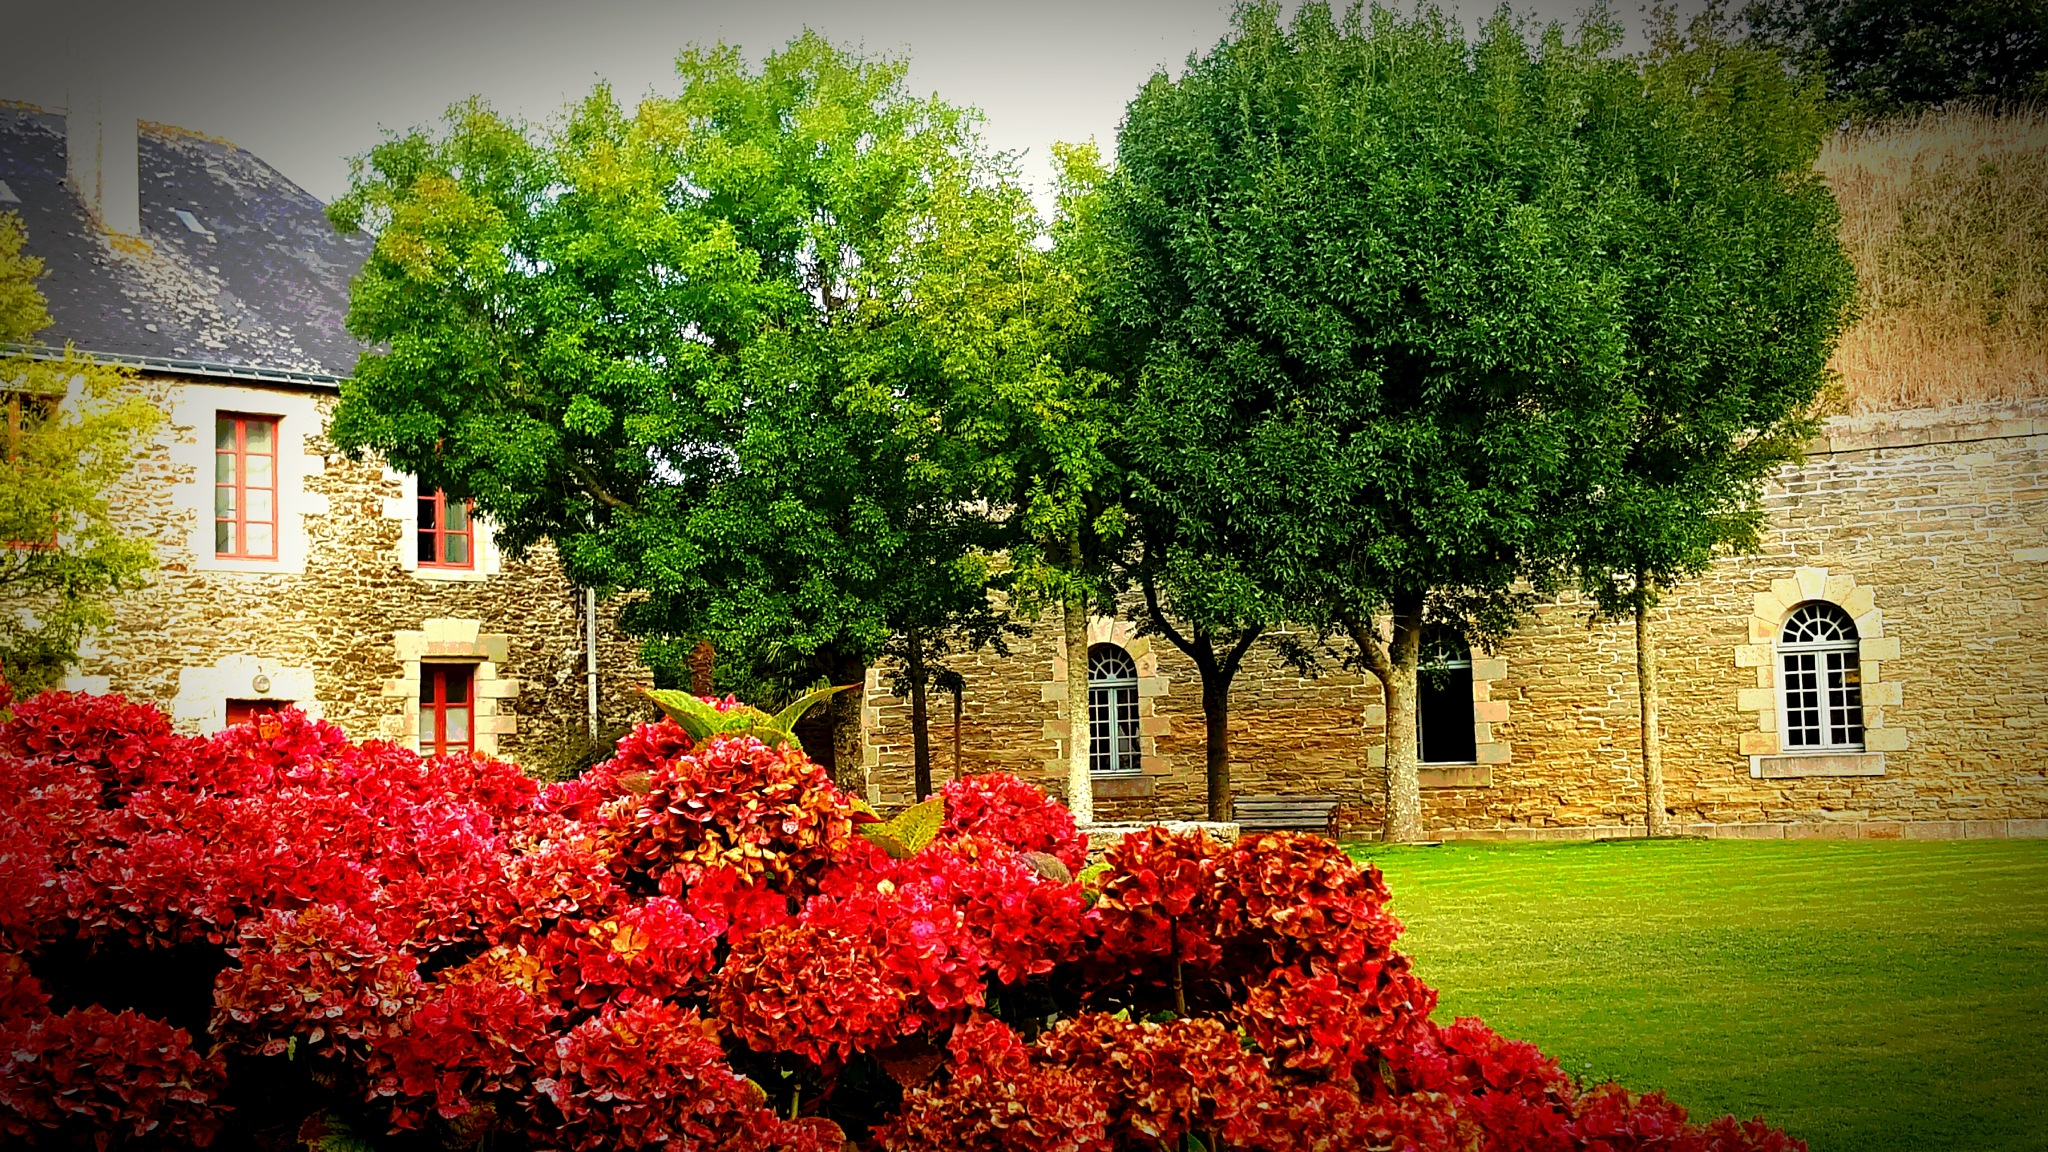 Citadelle garden by Tanit